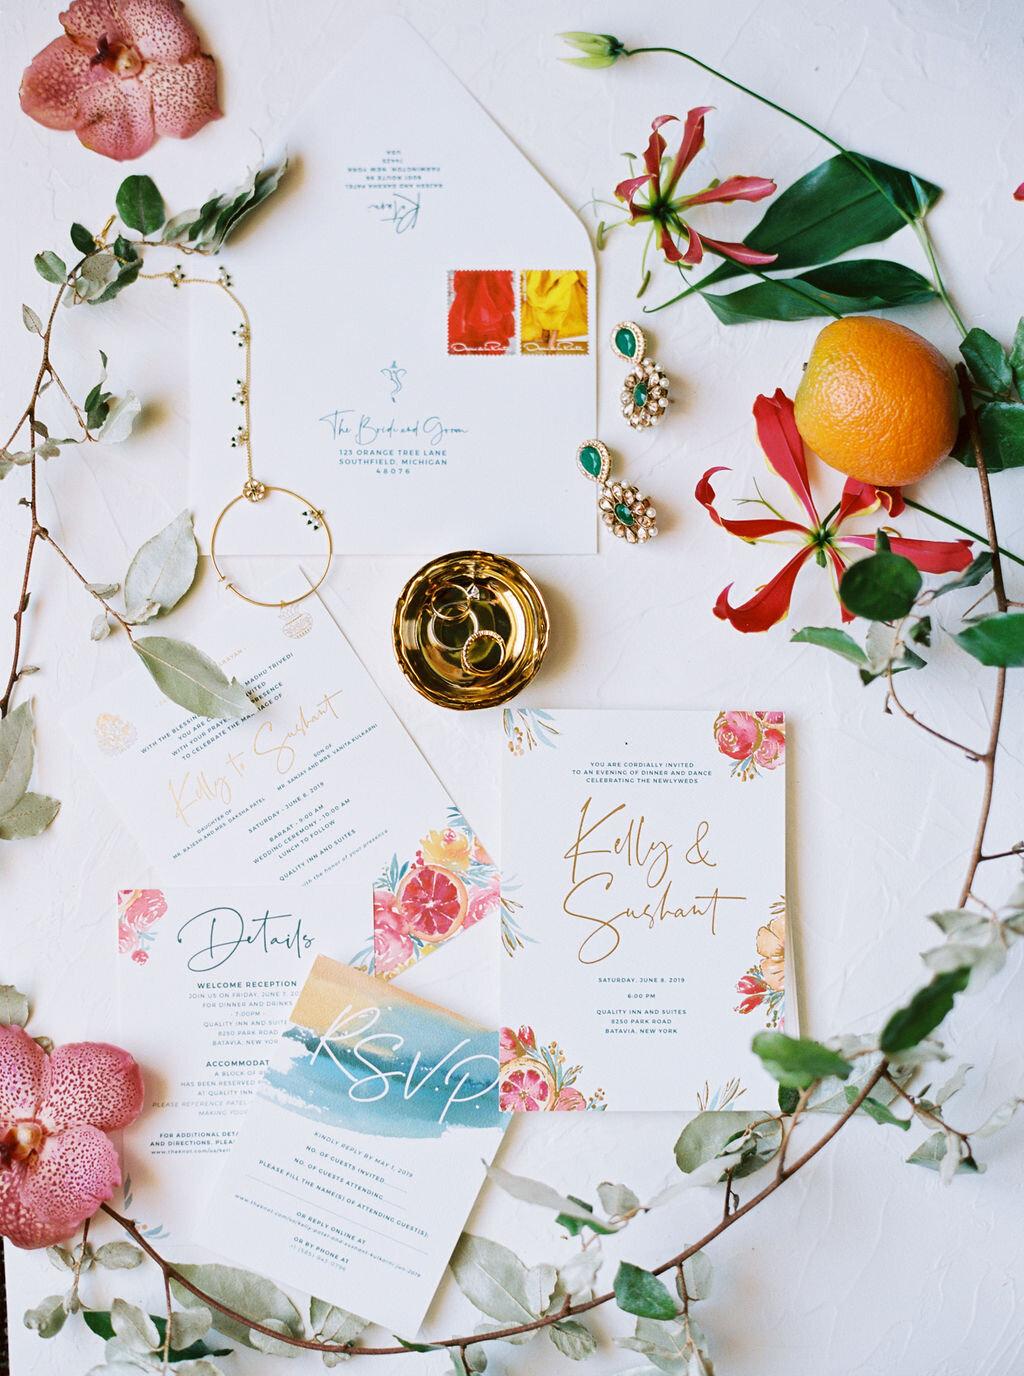 Alexandra-Elise-Photography-Ali-Reed-Film-Indian-Wedding-Photographer-Rochester-New-York-Saturday-AM-Getting-Ready-168.jpg